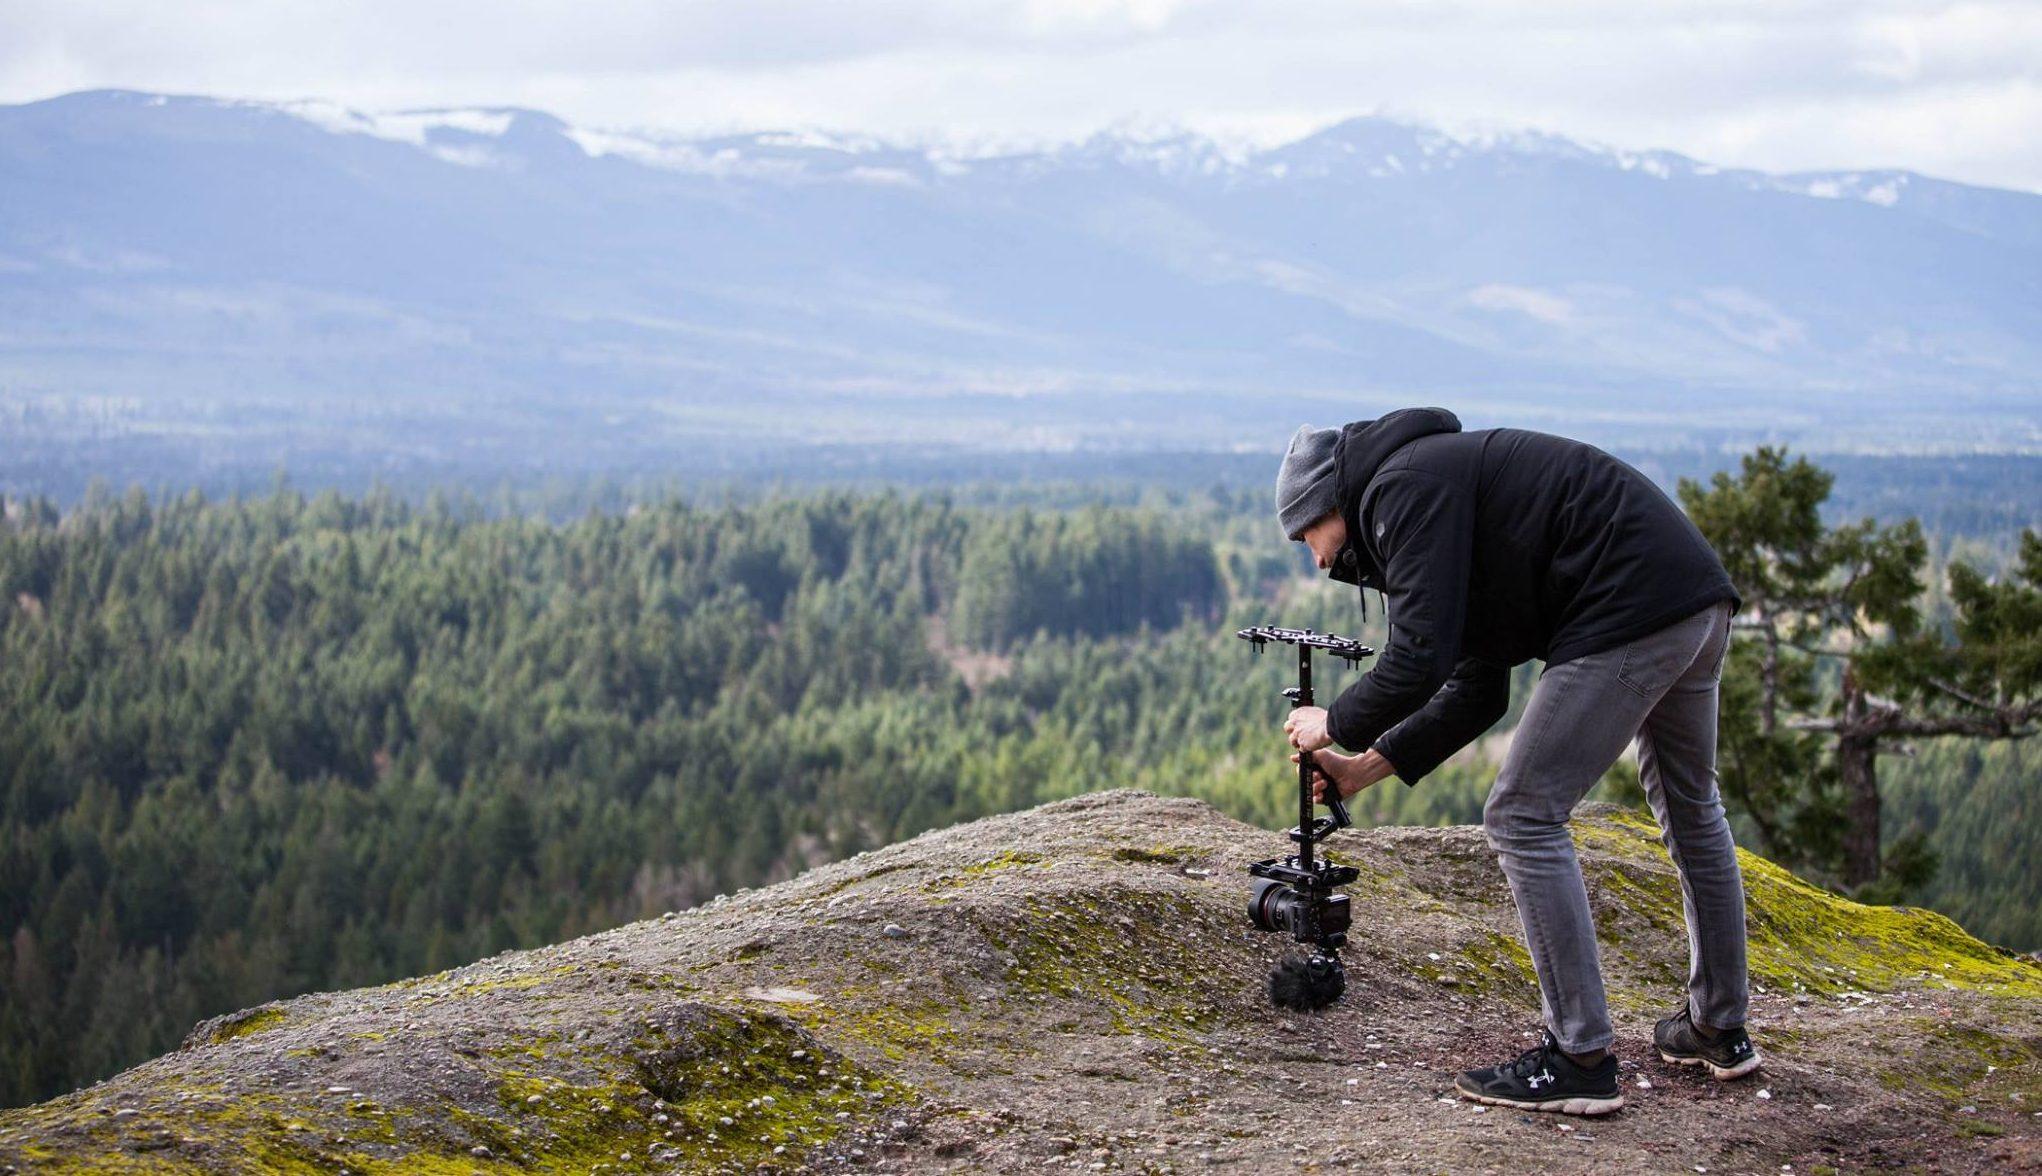 vancouver_video_production_Pixel_Motion_Films_glidecam_1